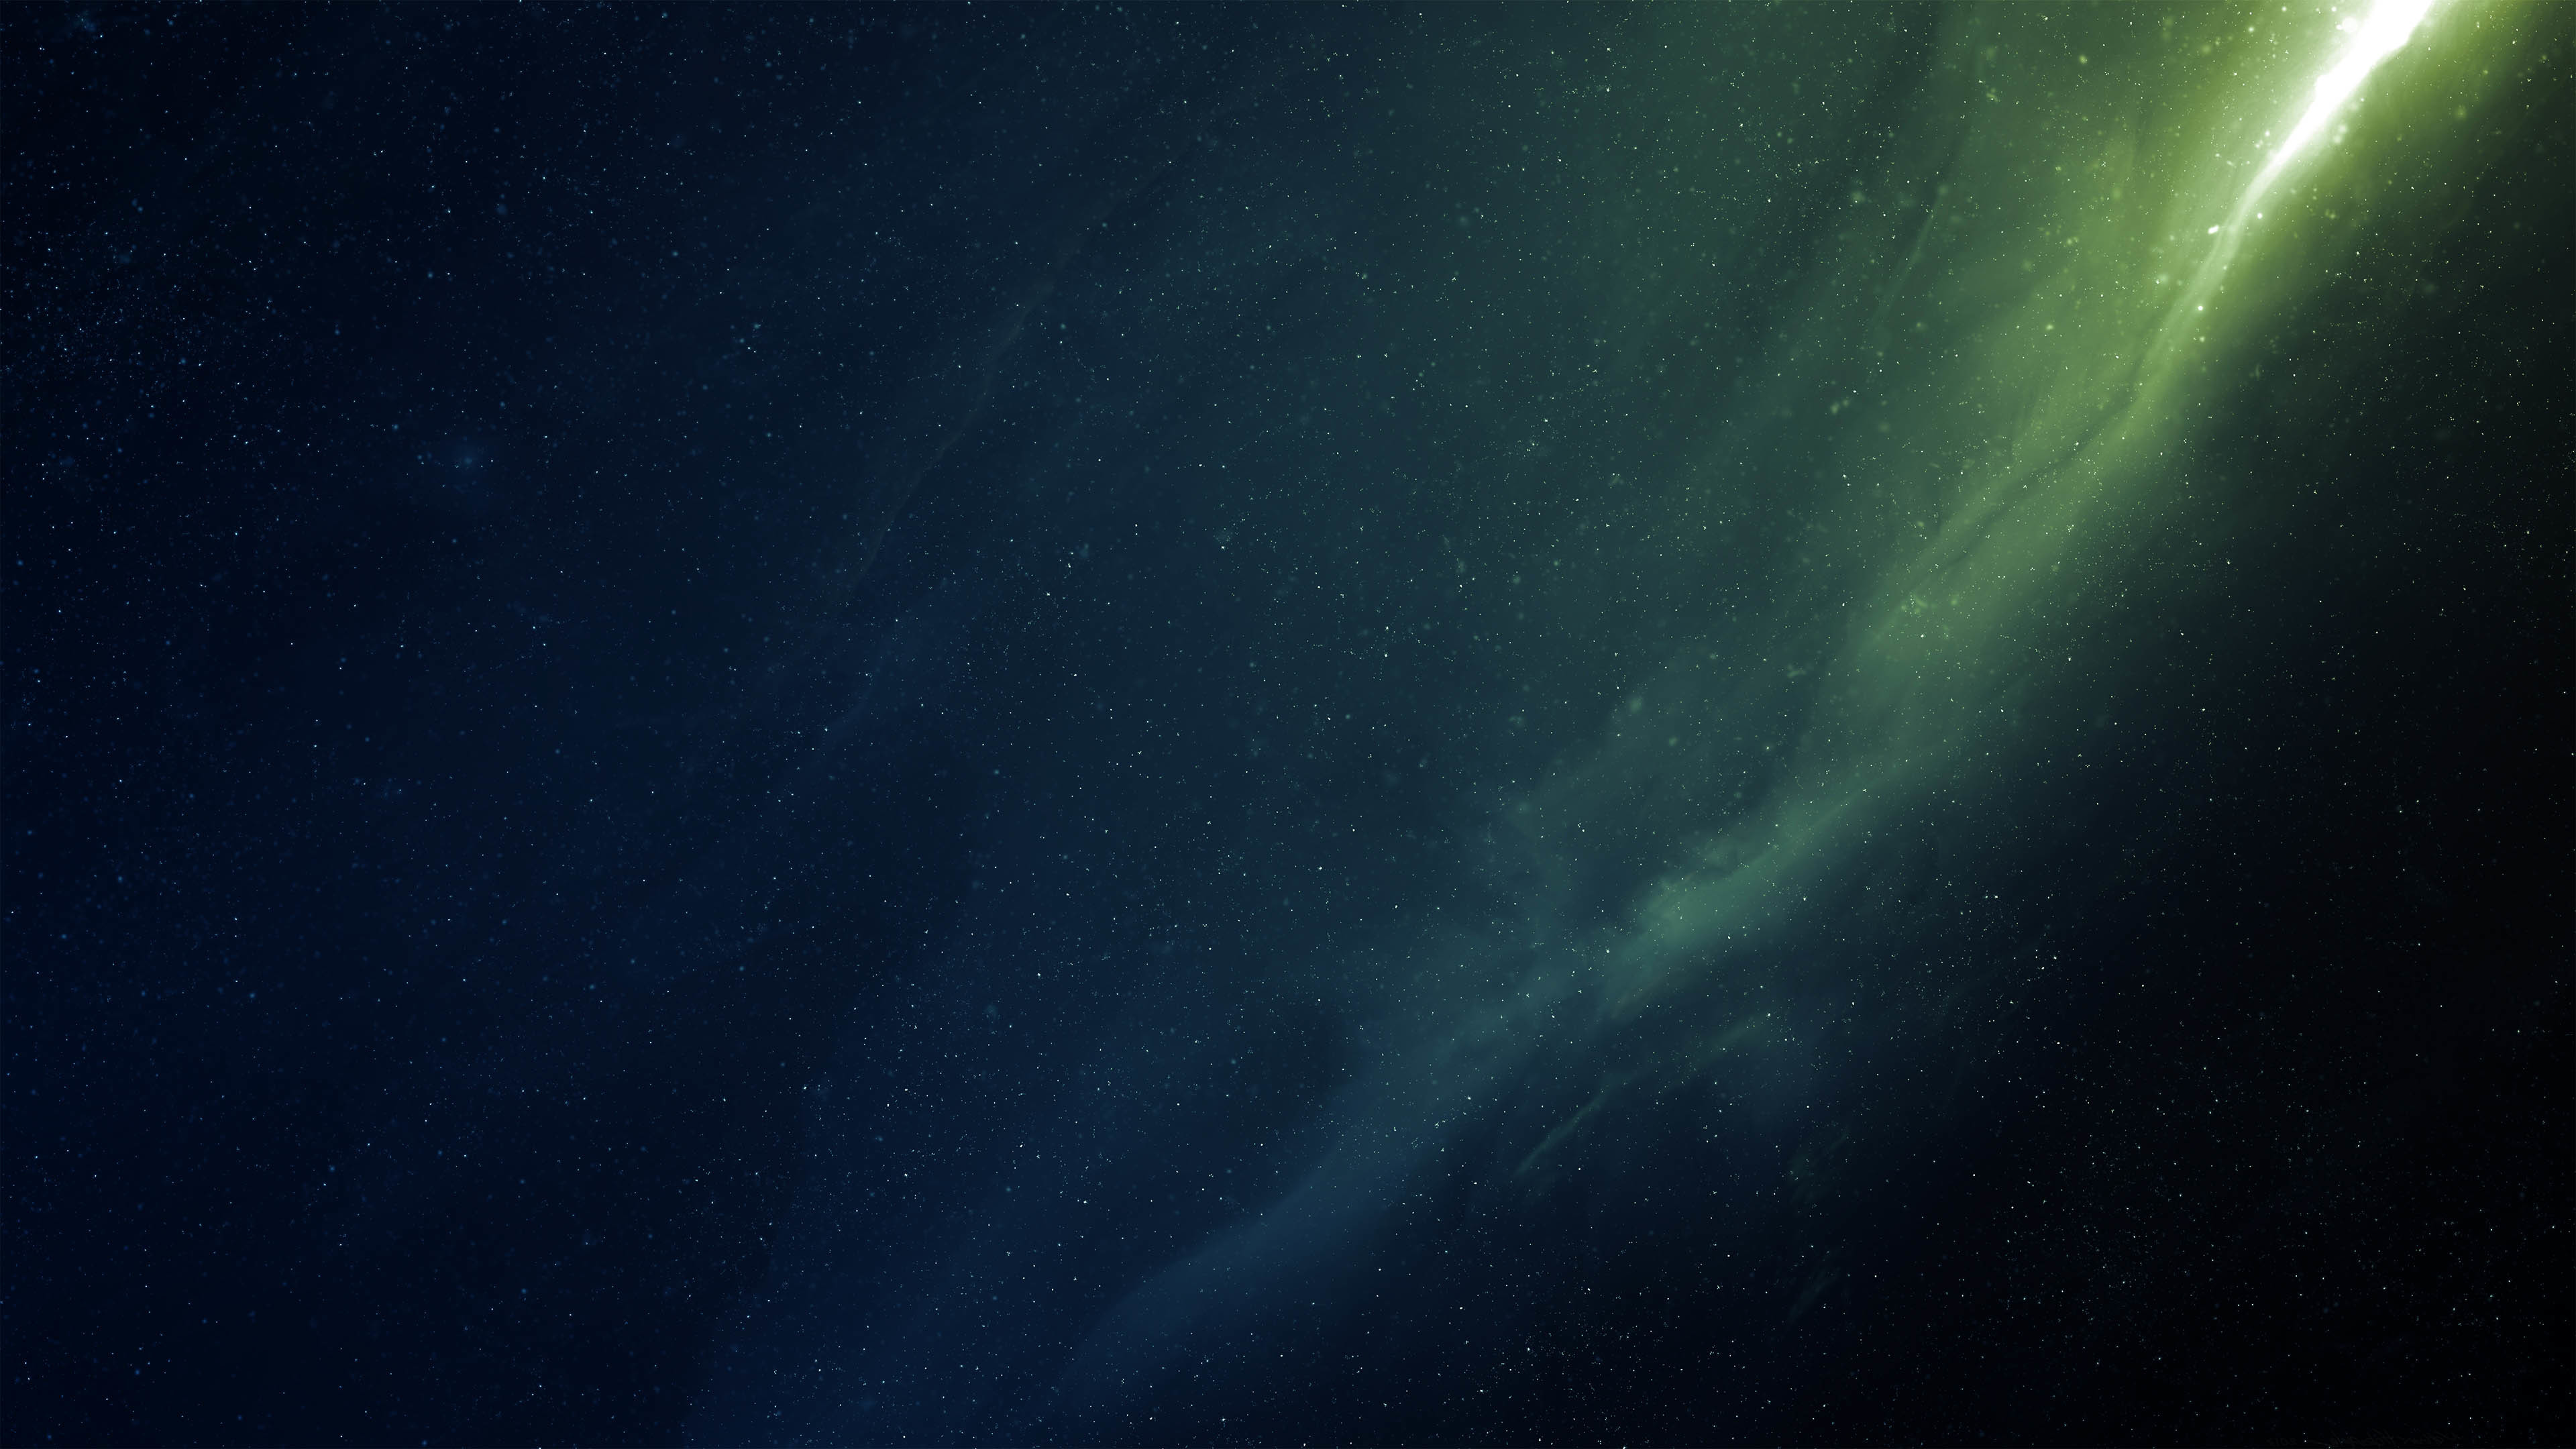 Space Wallpaper wallpaper